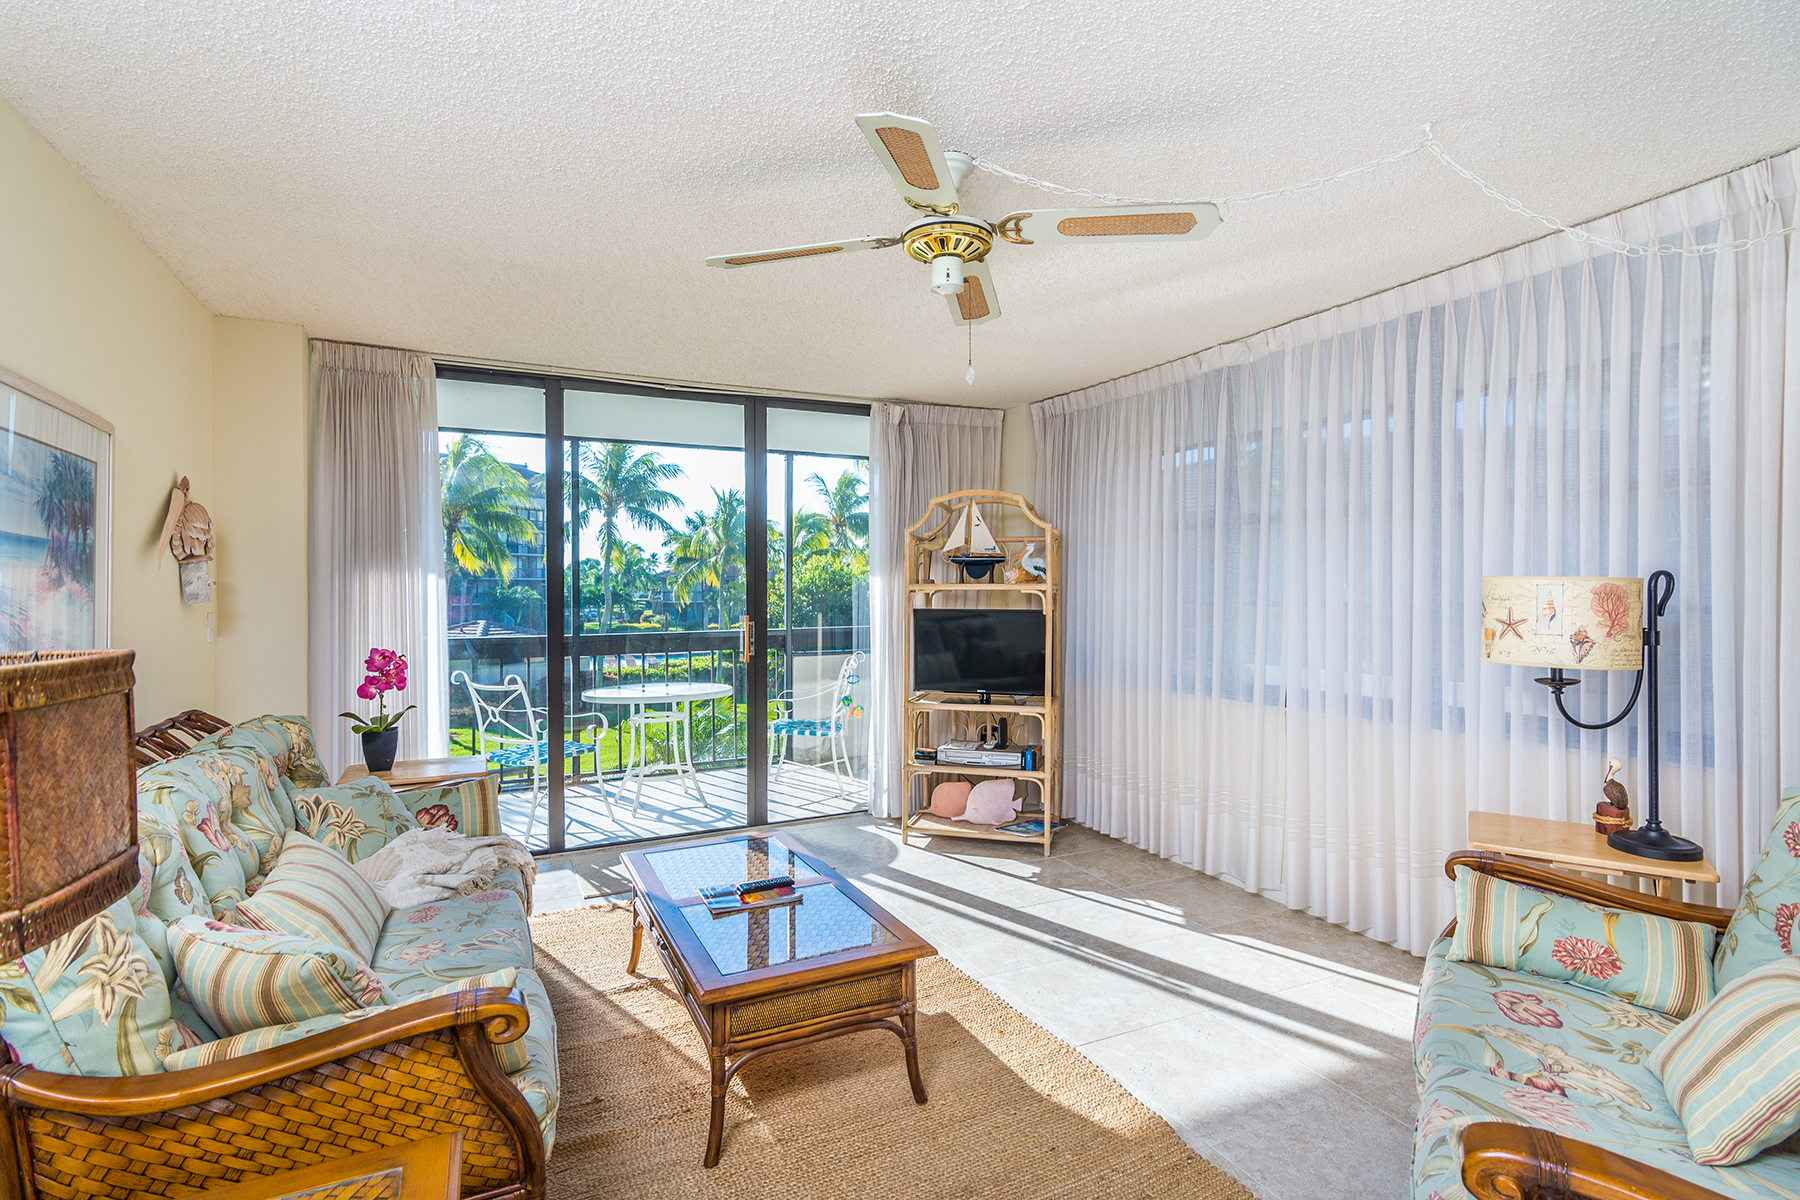 Condominium for Sale at SOUTH SEAS - SOUTH SEAS EAST 601 Seaview Ct 208 Marco Island, Florida 34145 United States